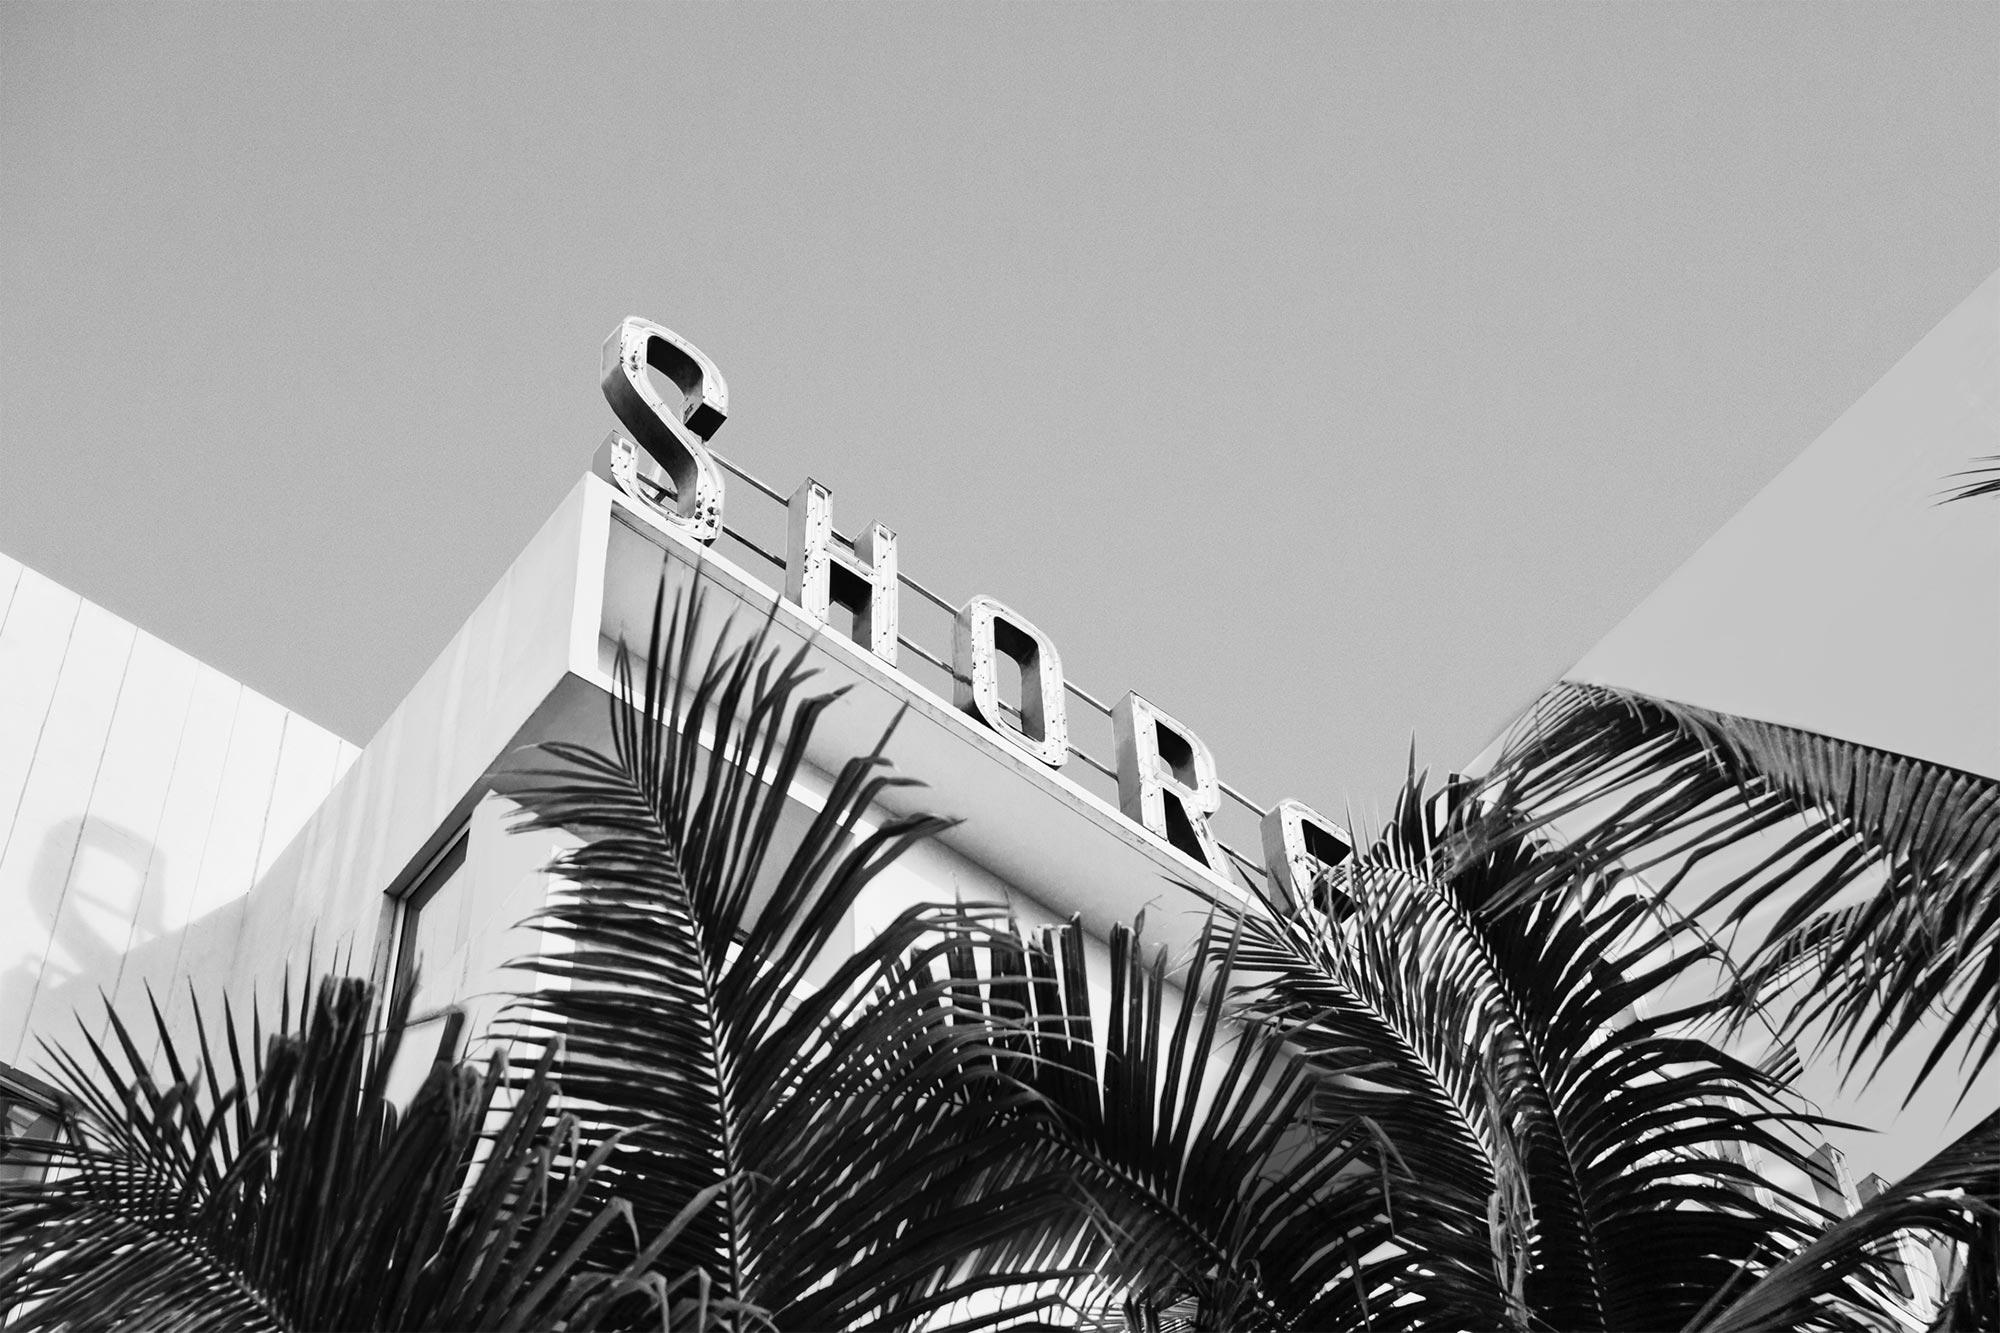 Art Direction for The Shore Club, Shot by Pamela Hanson